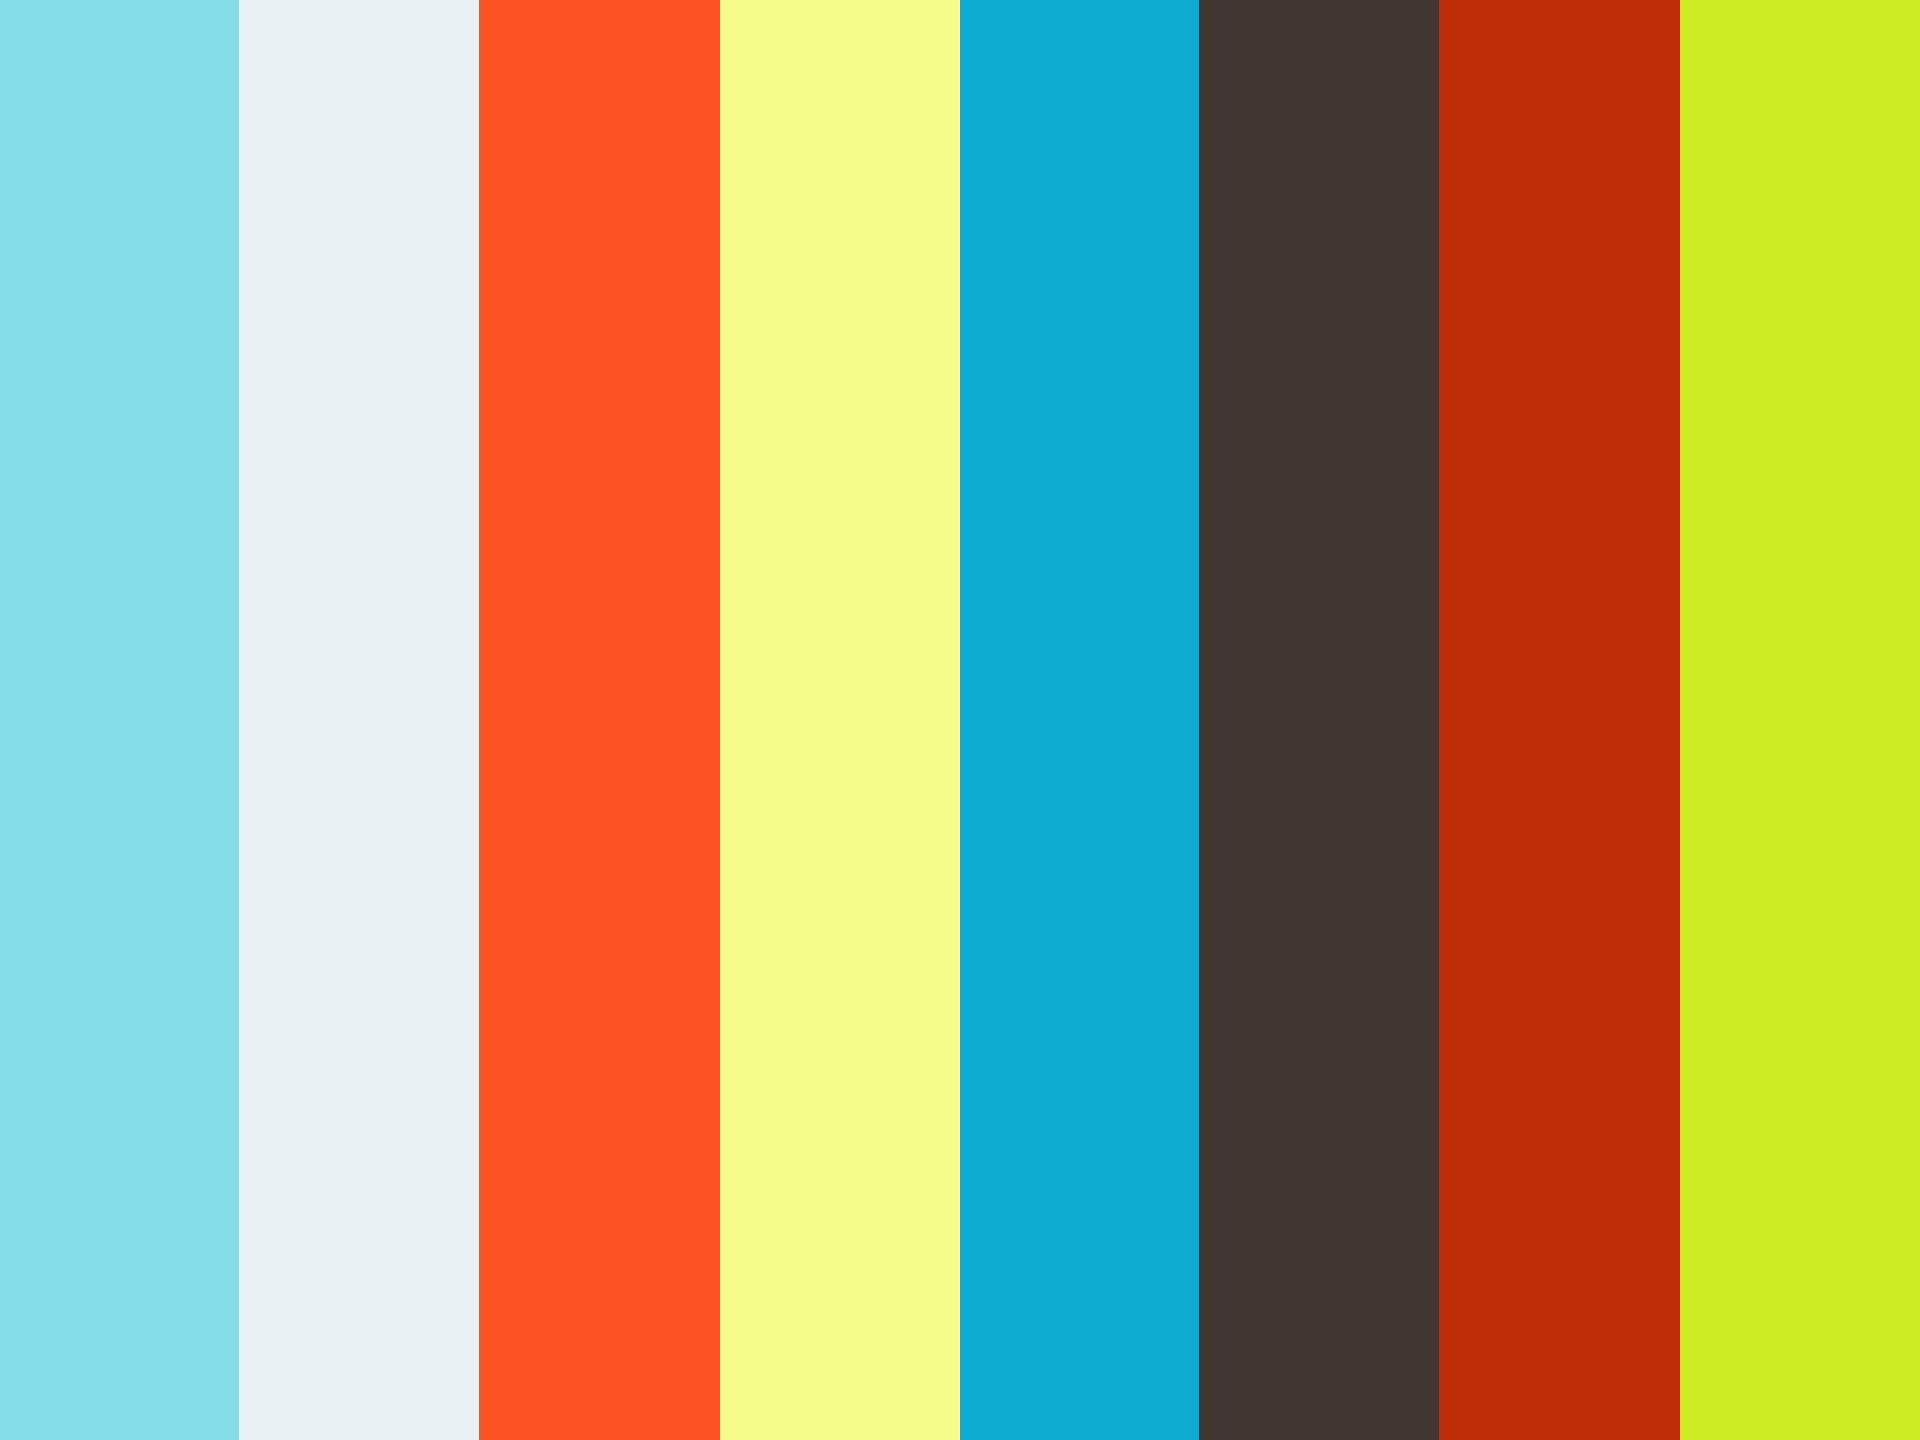 MERCEDES-BENZ E300 AMG - BLACK - 2018